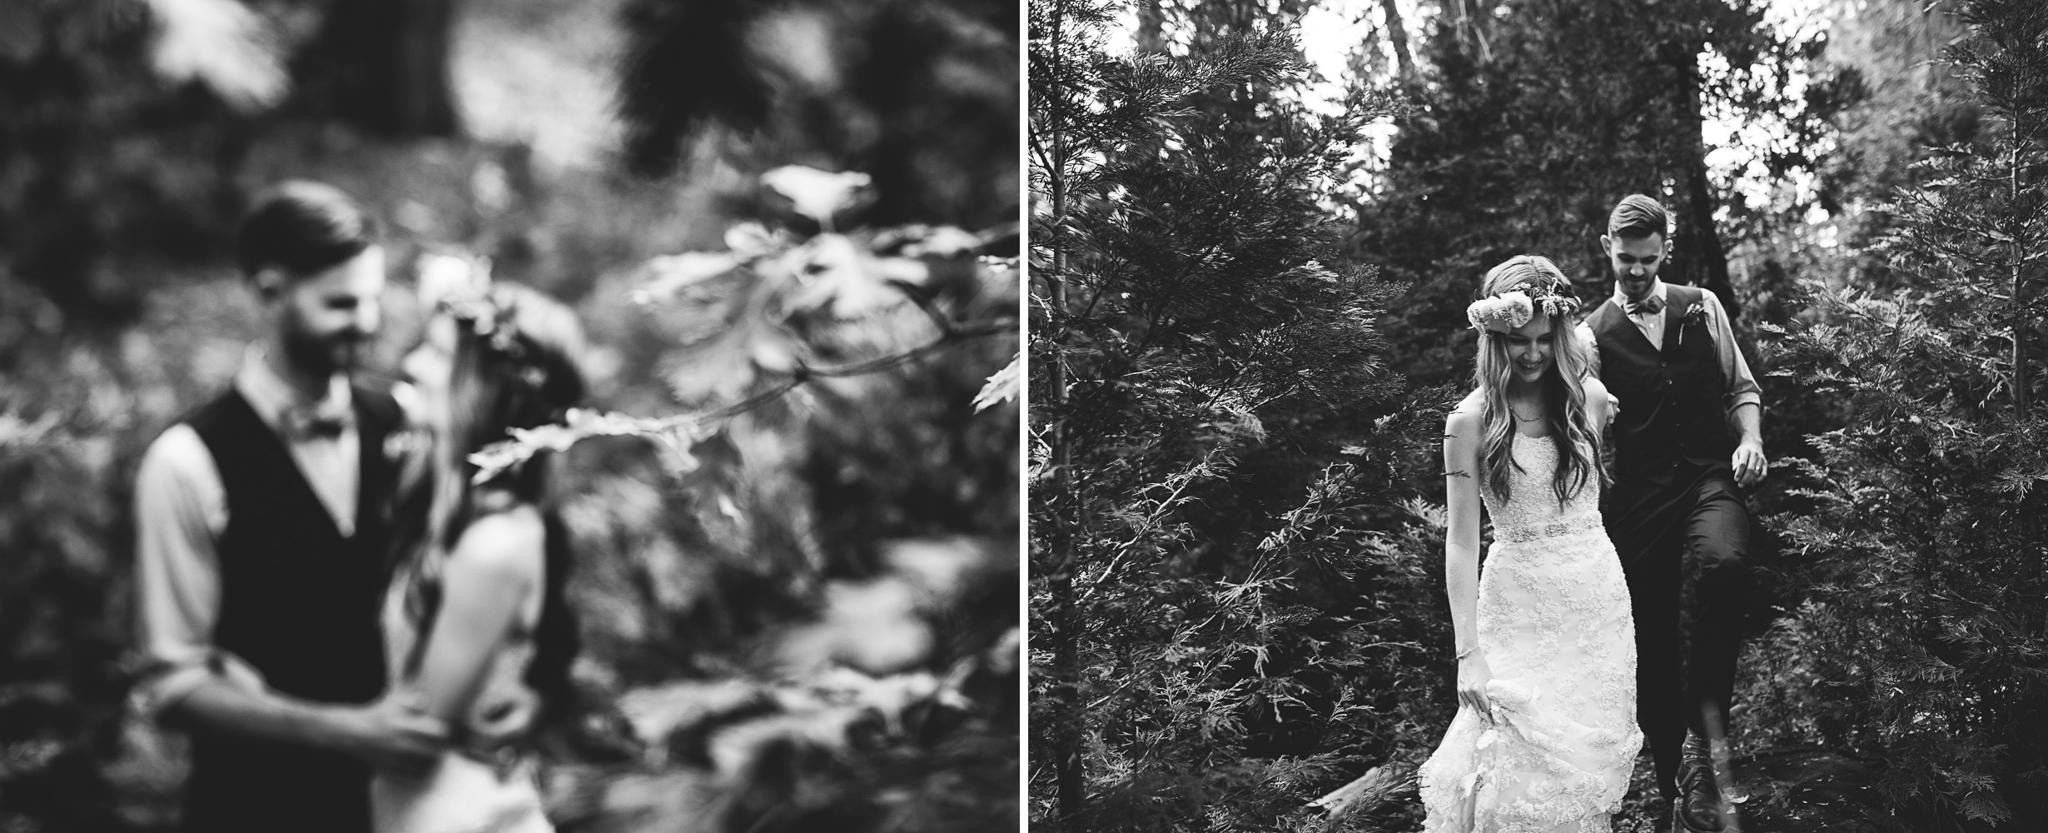 ©Isaiah & Taylor Photography - Pine Rose Cabin - Lake Arrowhead - Los Angeles Wedding Photographer-081.jpg